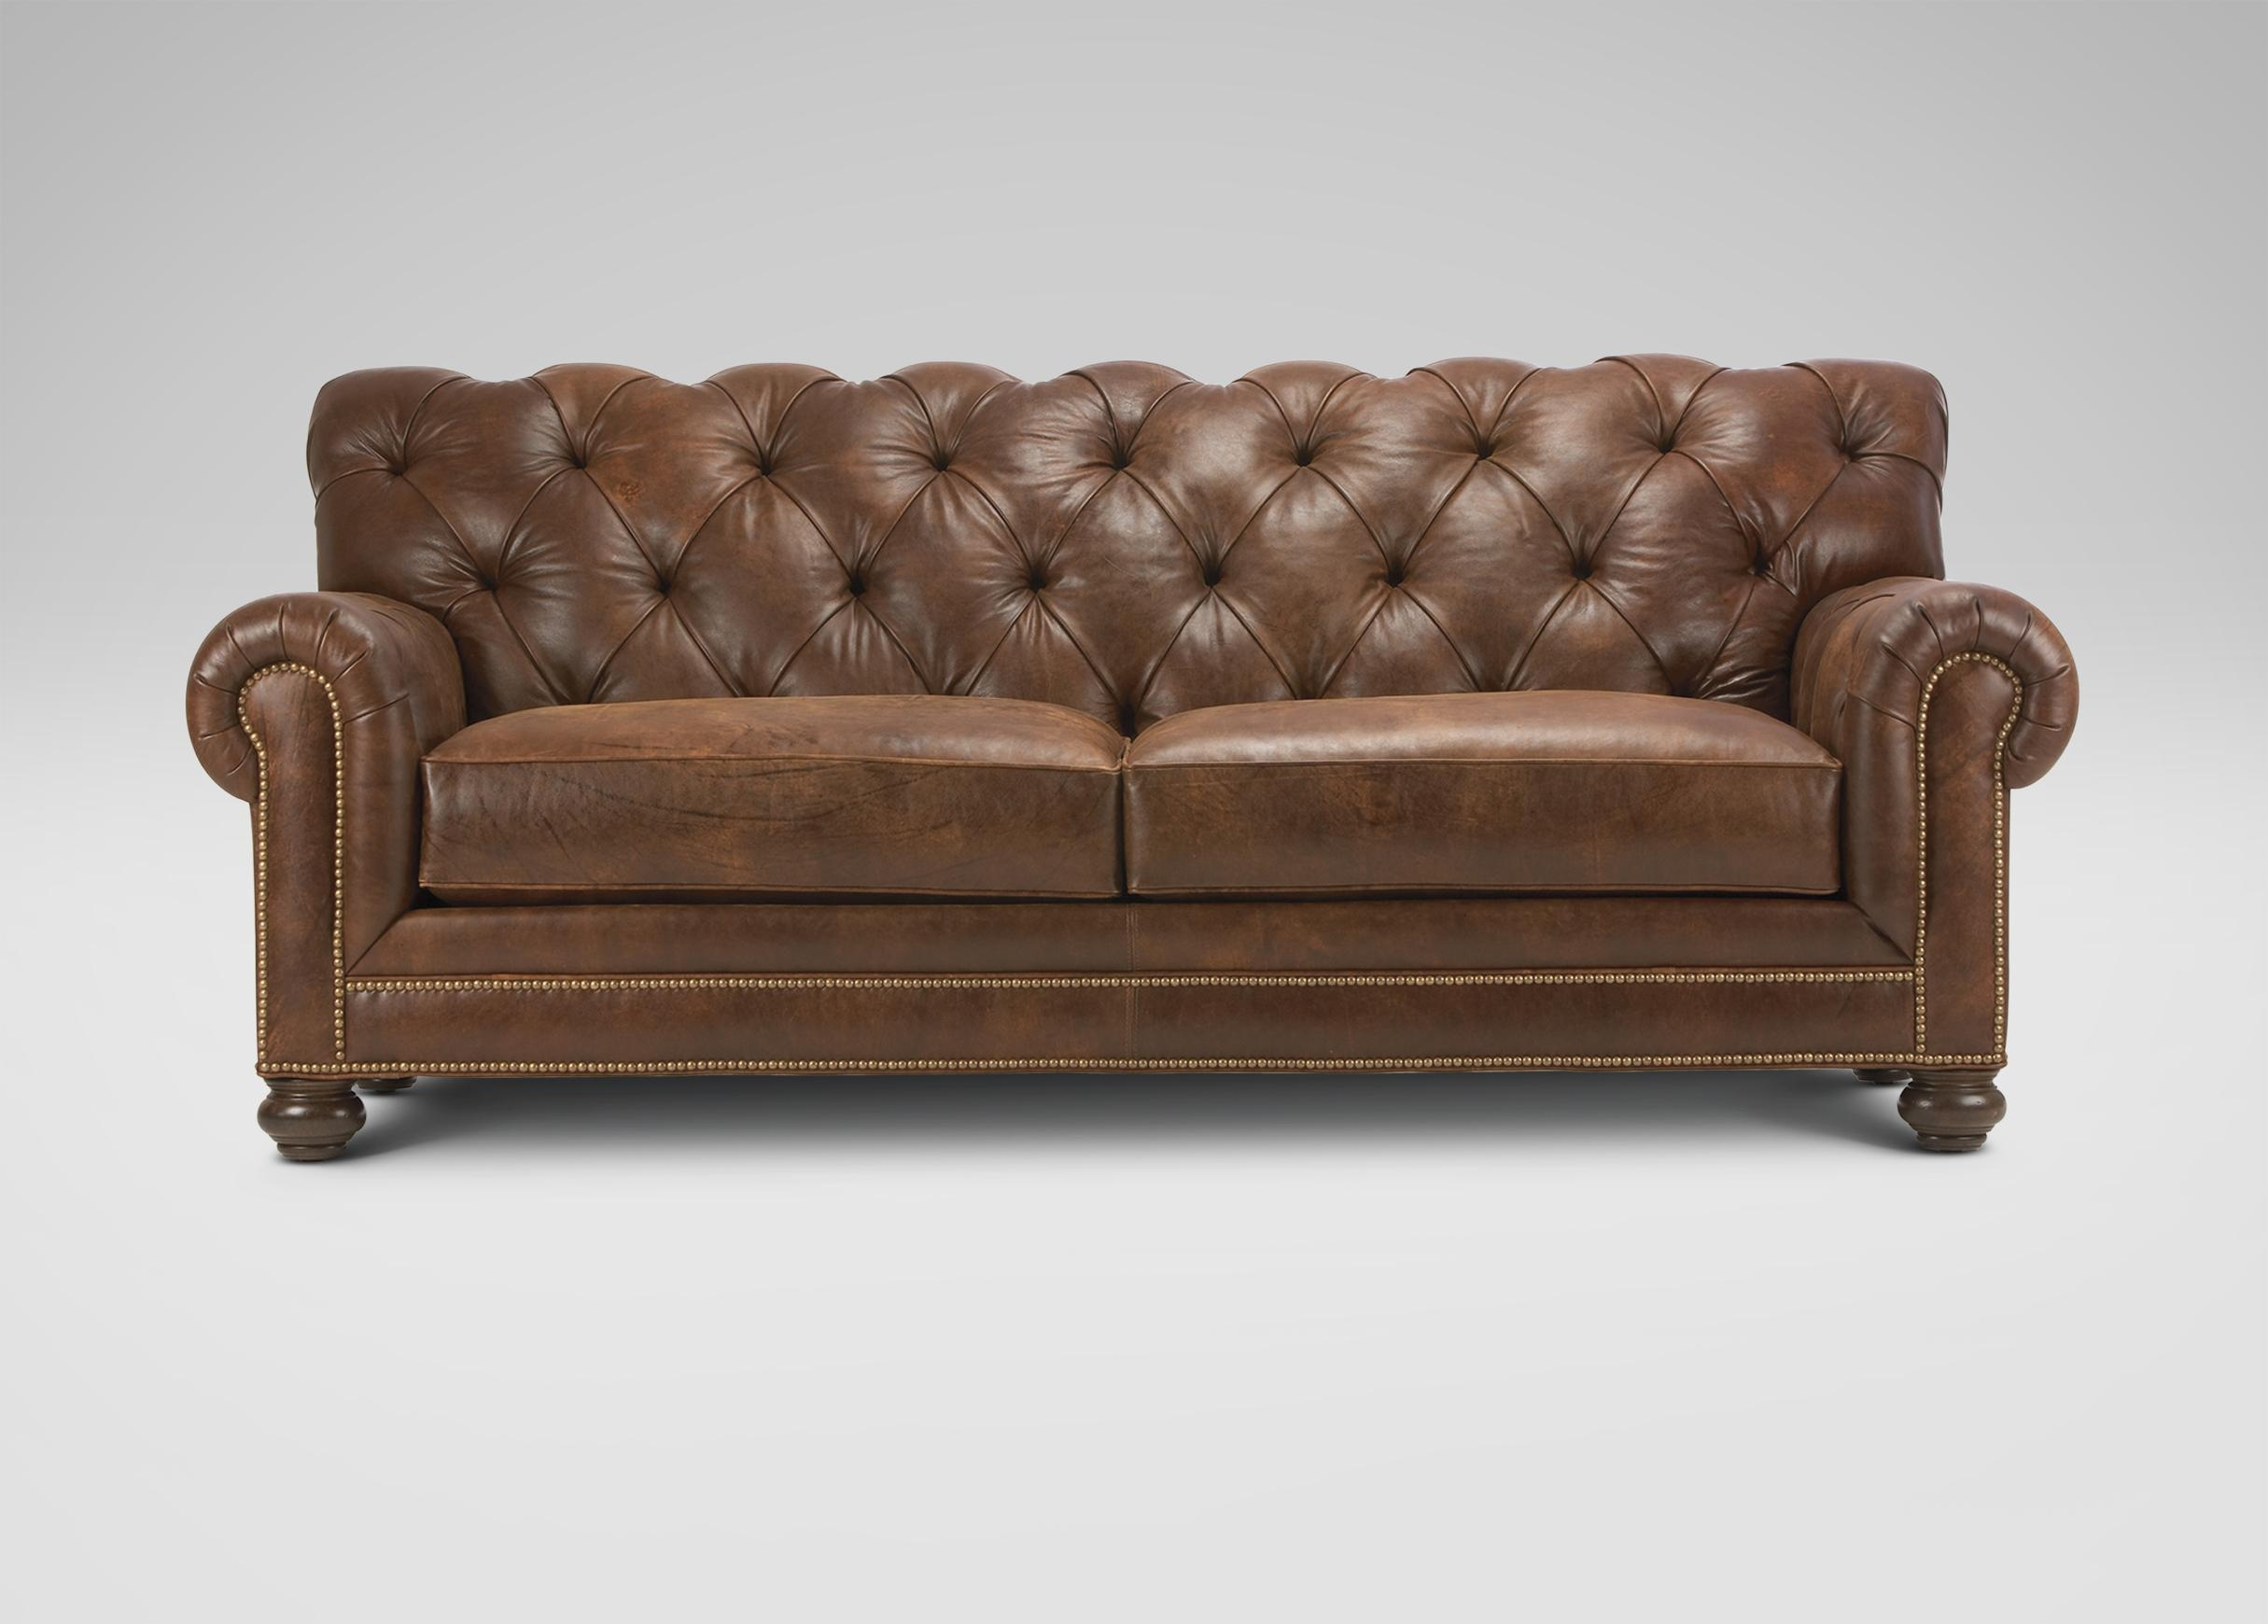 Chadwick Leather Sofa | Sofas & Loveseats Regarding Chadwick Sofas (Image 4 of 20)